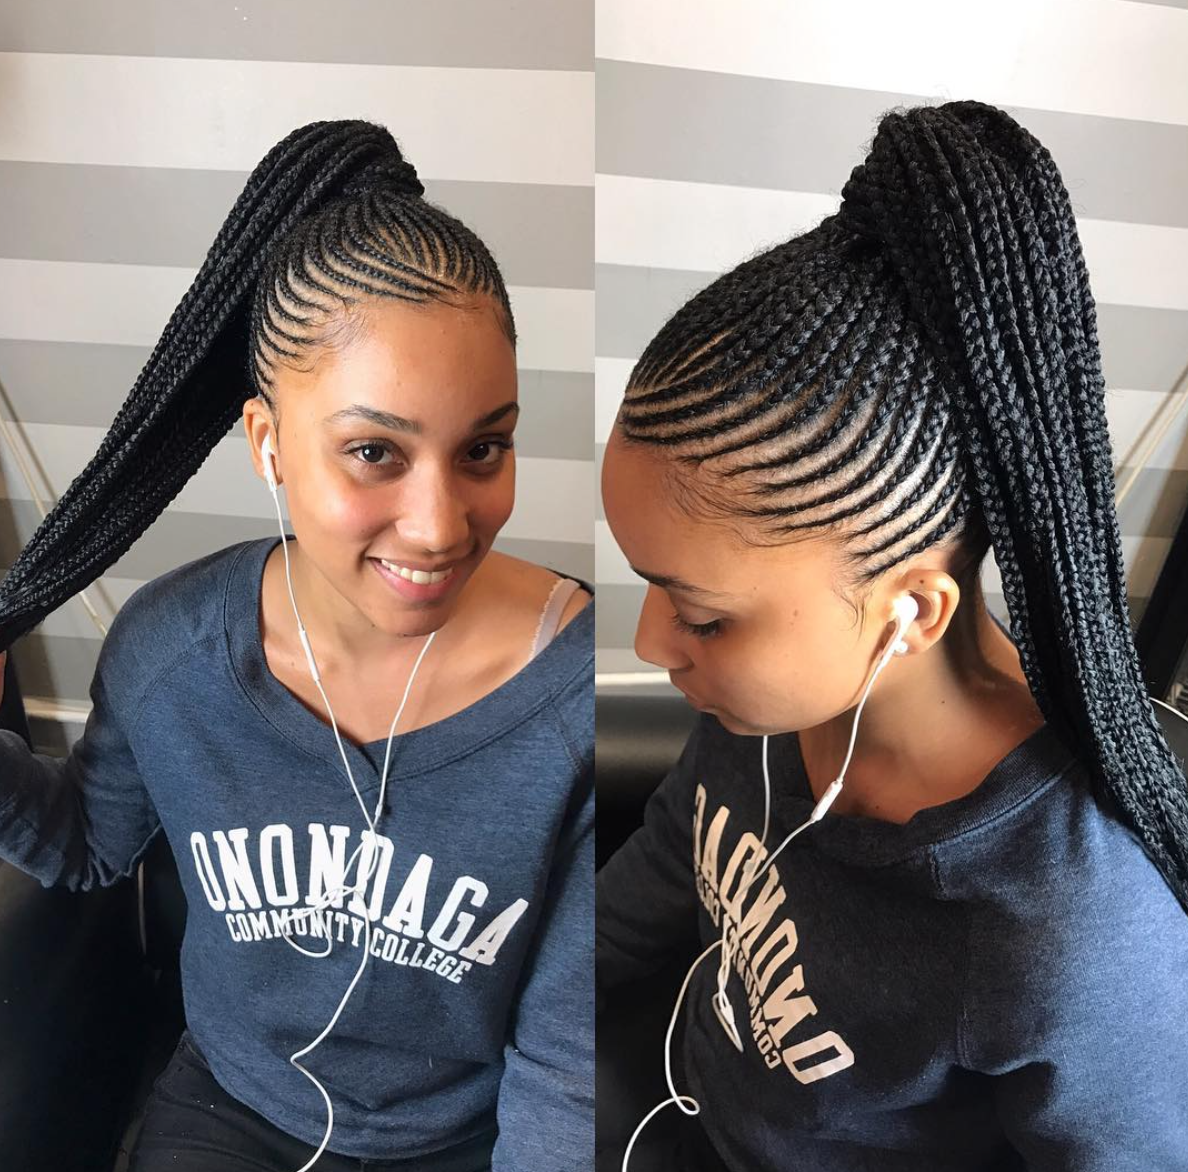 Beautiful Work By Handsnheartss Https Blackhairinformation Com Uncategorized Beautiful Work Han Cornrow Hairstyles Braided Ponytail Hairstyles Hair Styles